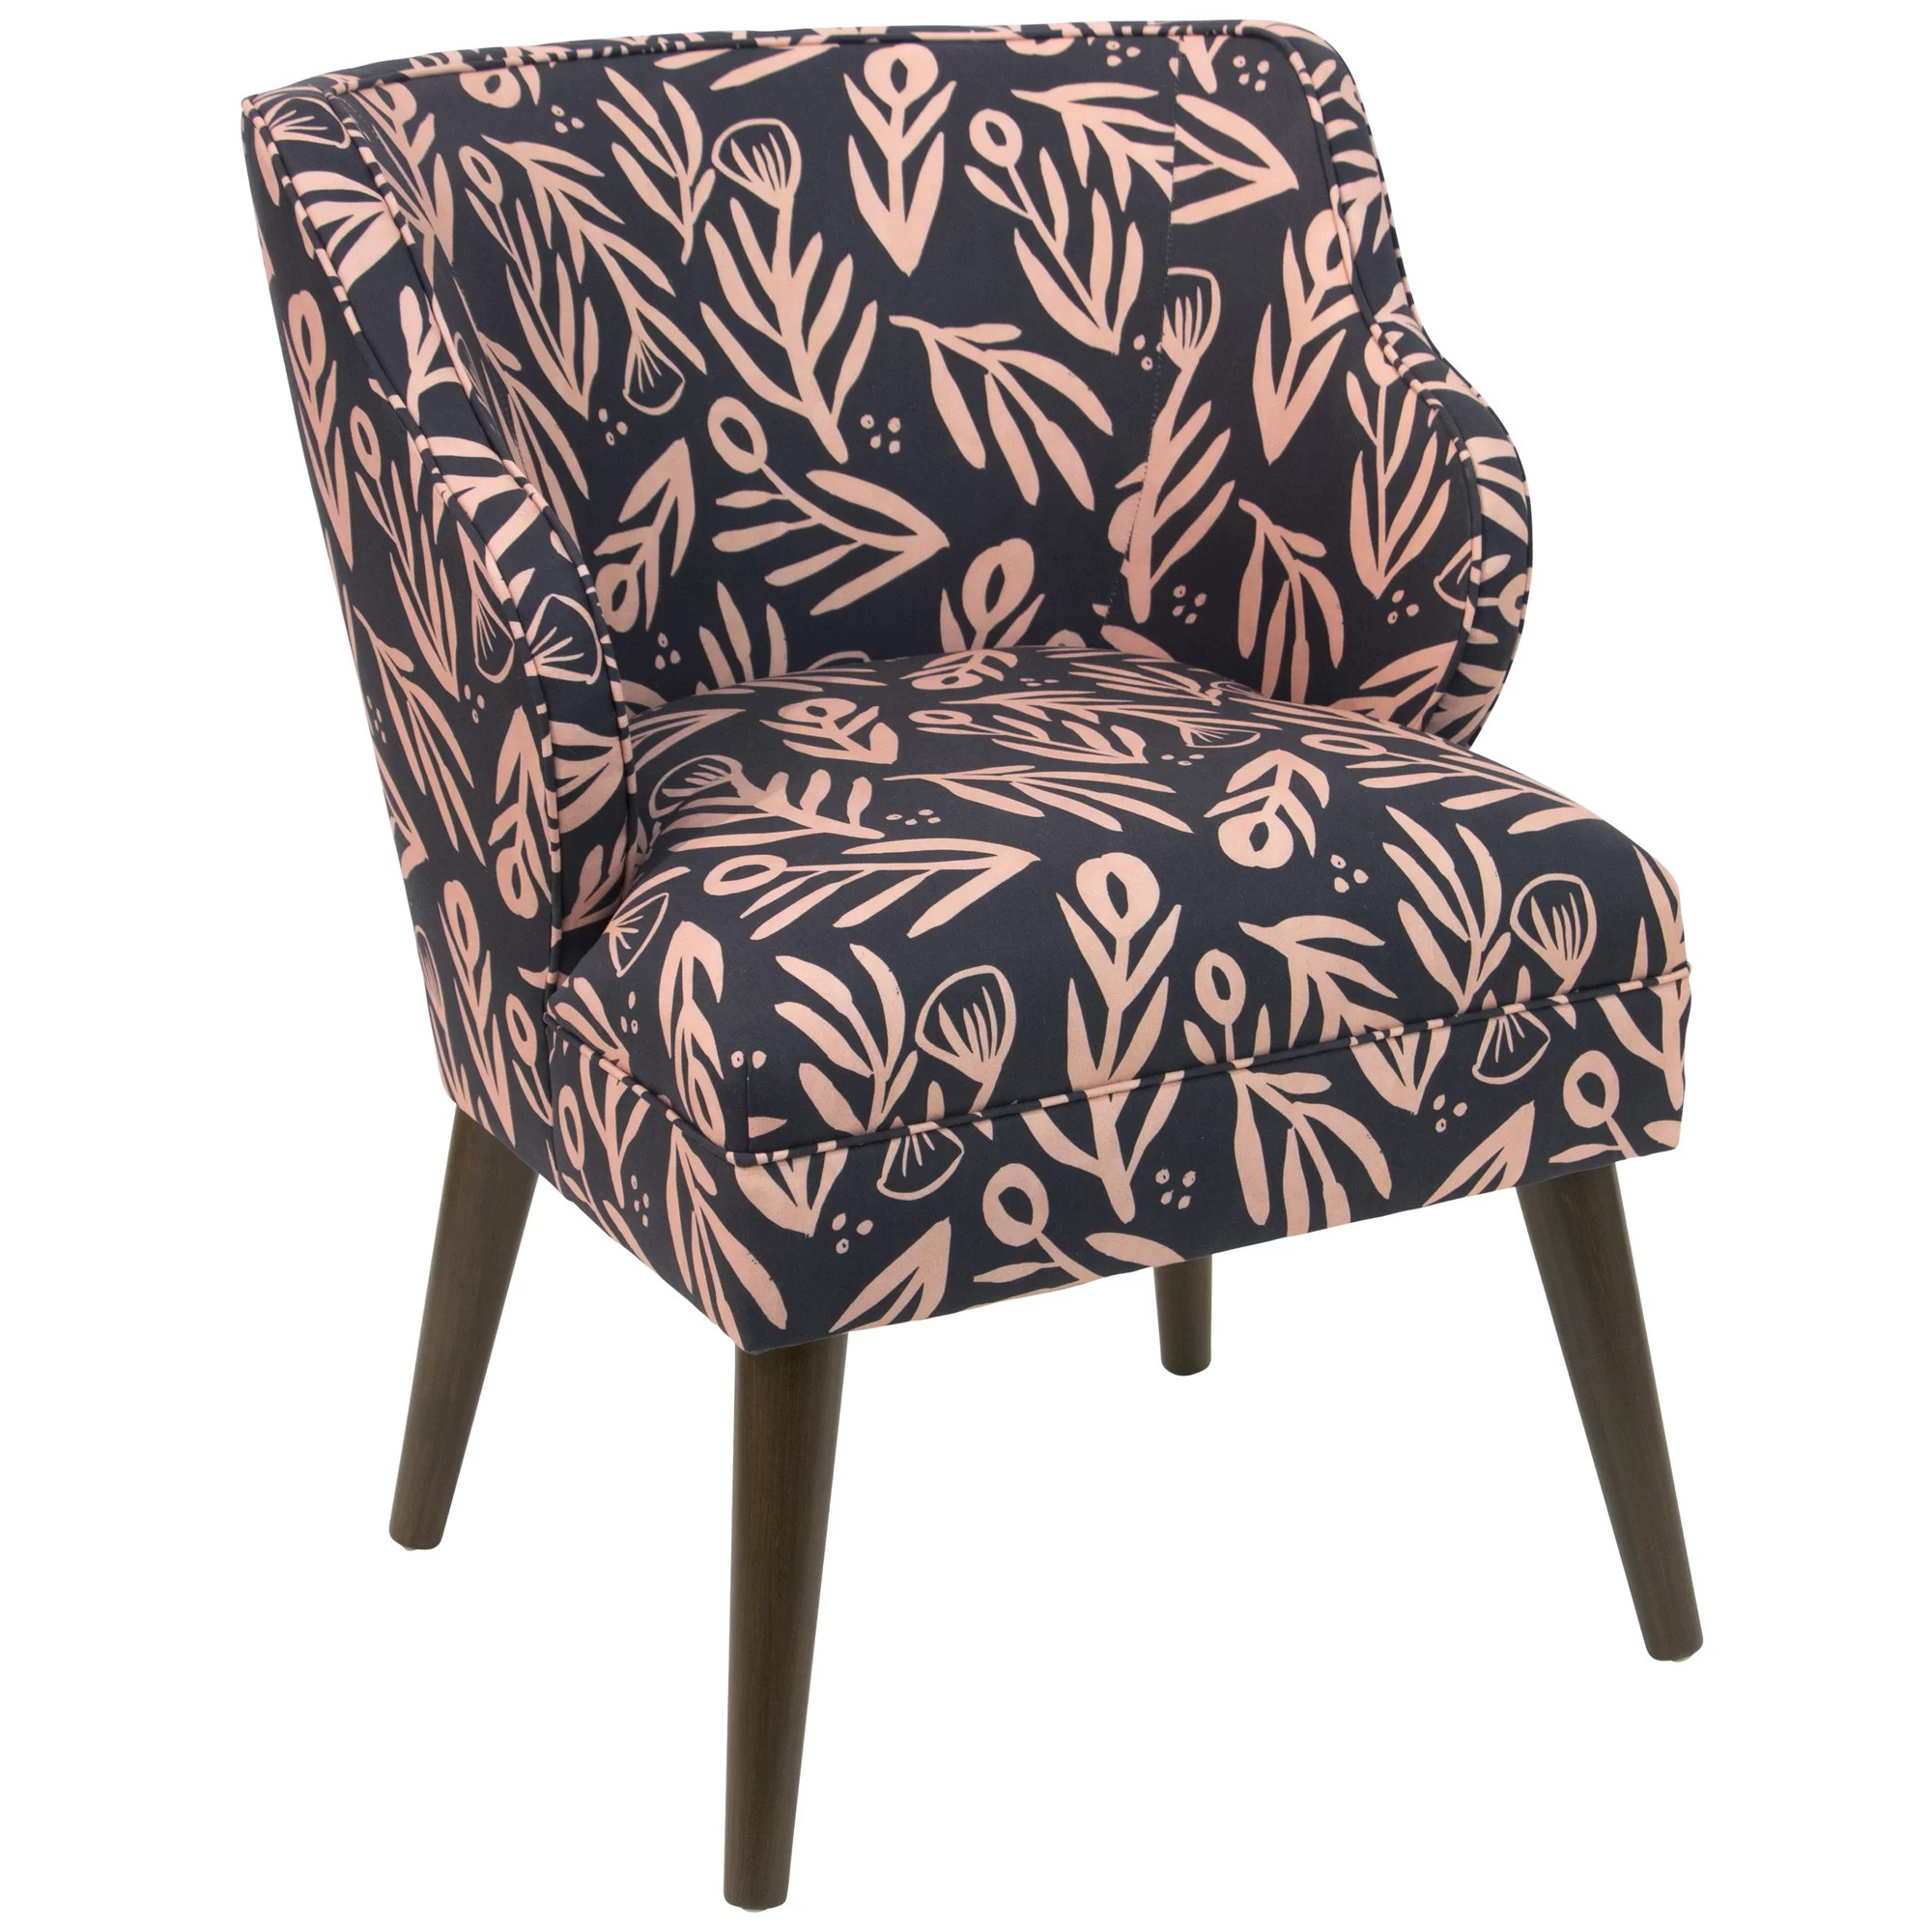 floral arm chair bungee at target brayden studio alejandra modern bold linen cotton